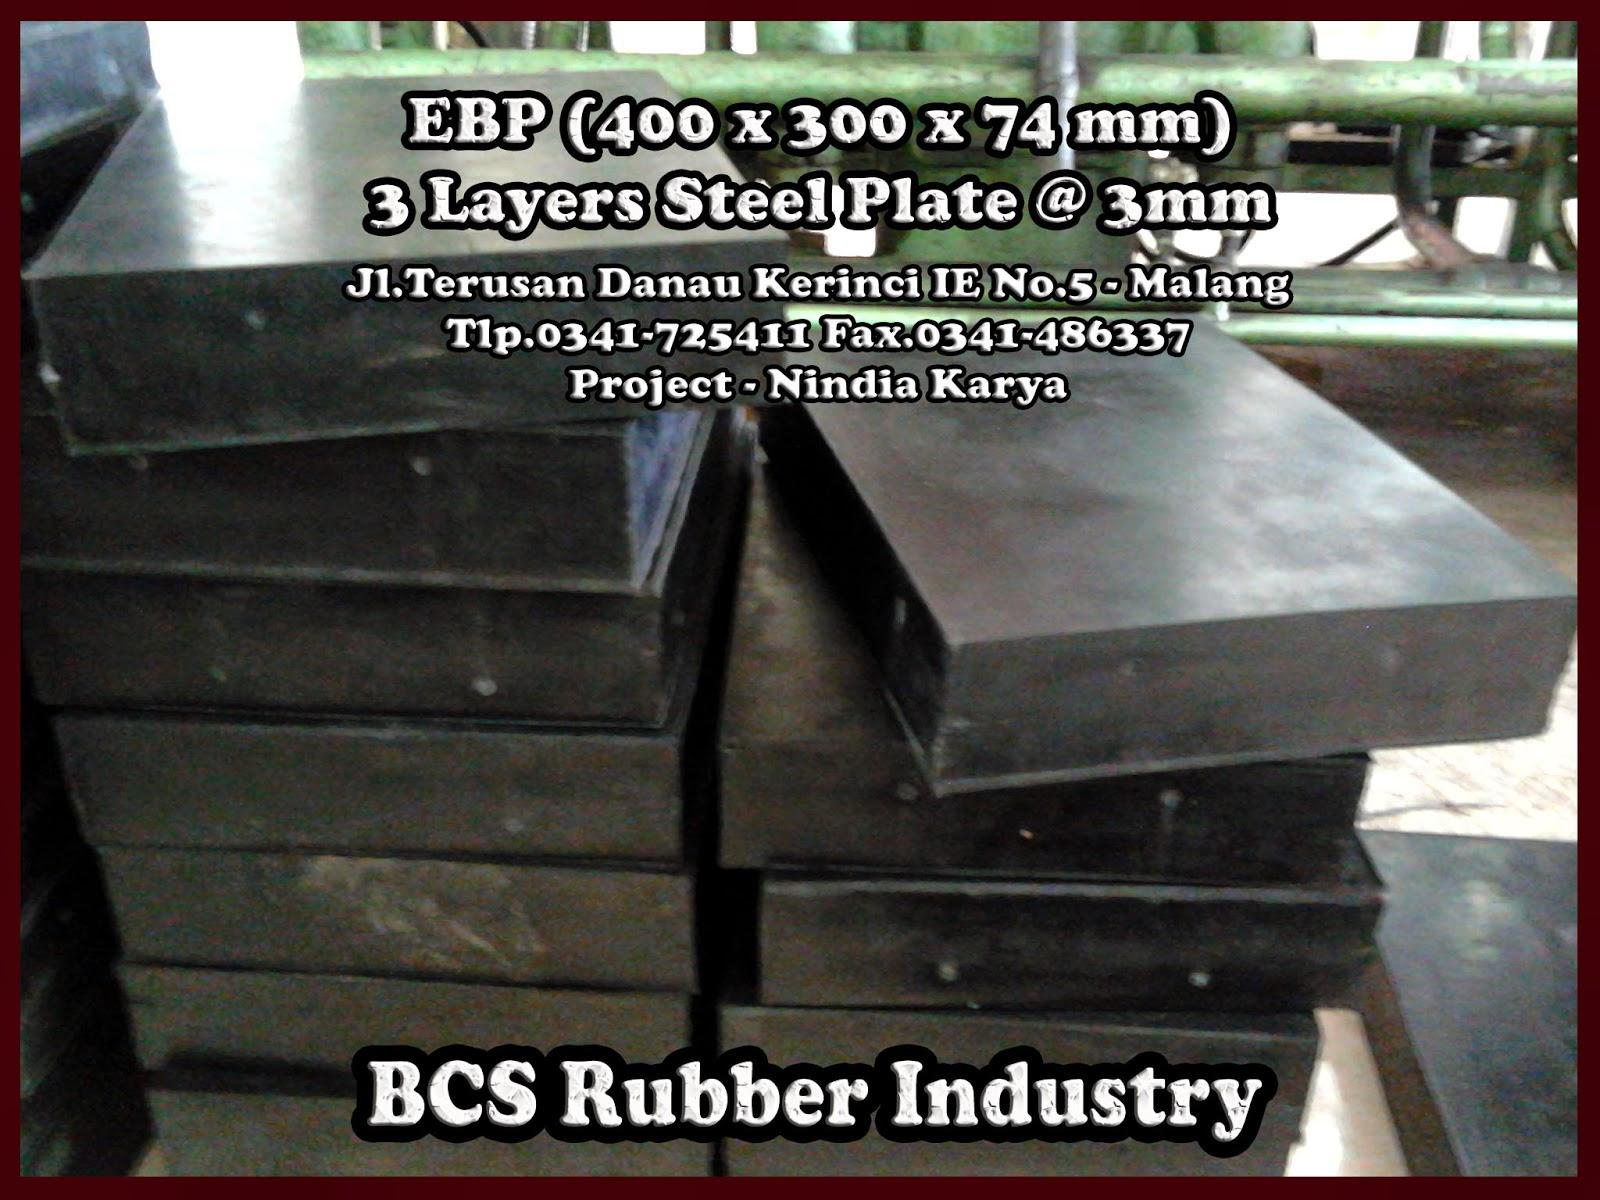 - Product Elastomer Bearing Pads - Steel Plate (Laminated)